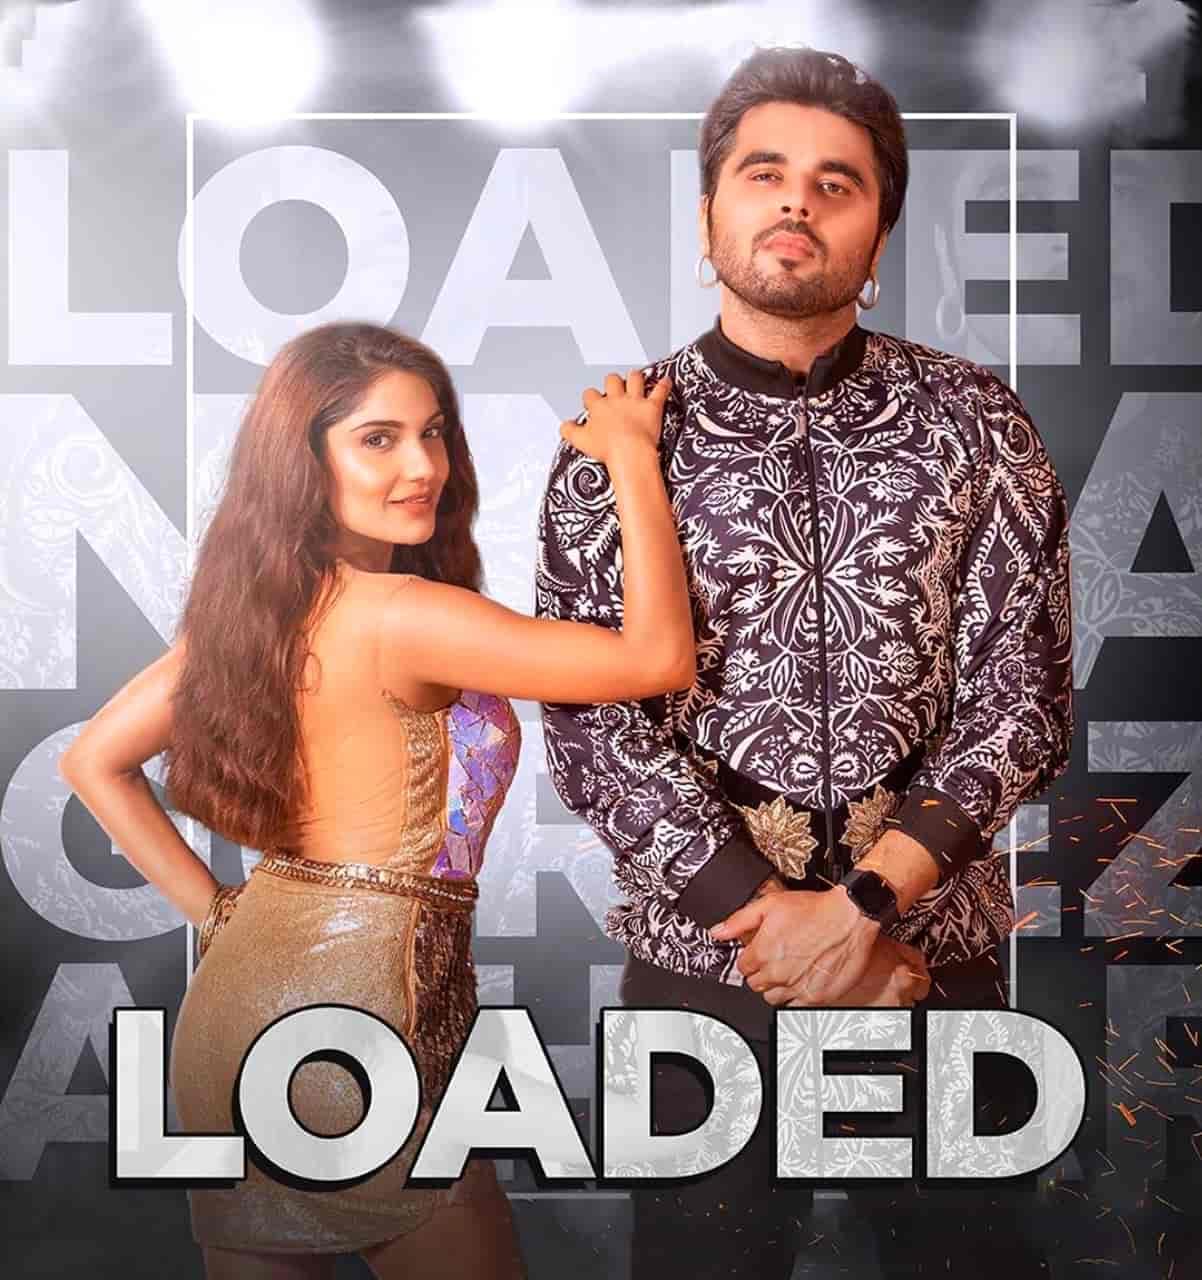 Loaded Punjabi Song Image By Ninja and Gurlez Akhtar